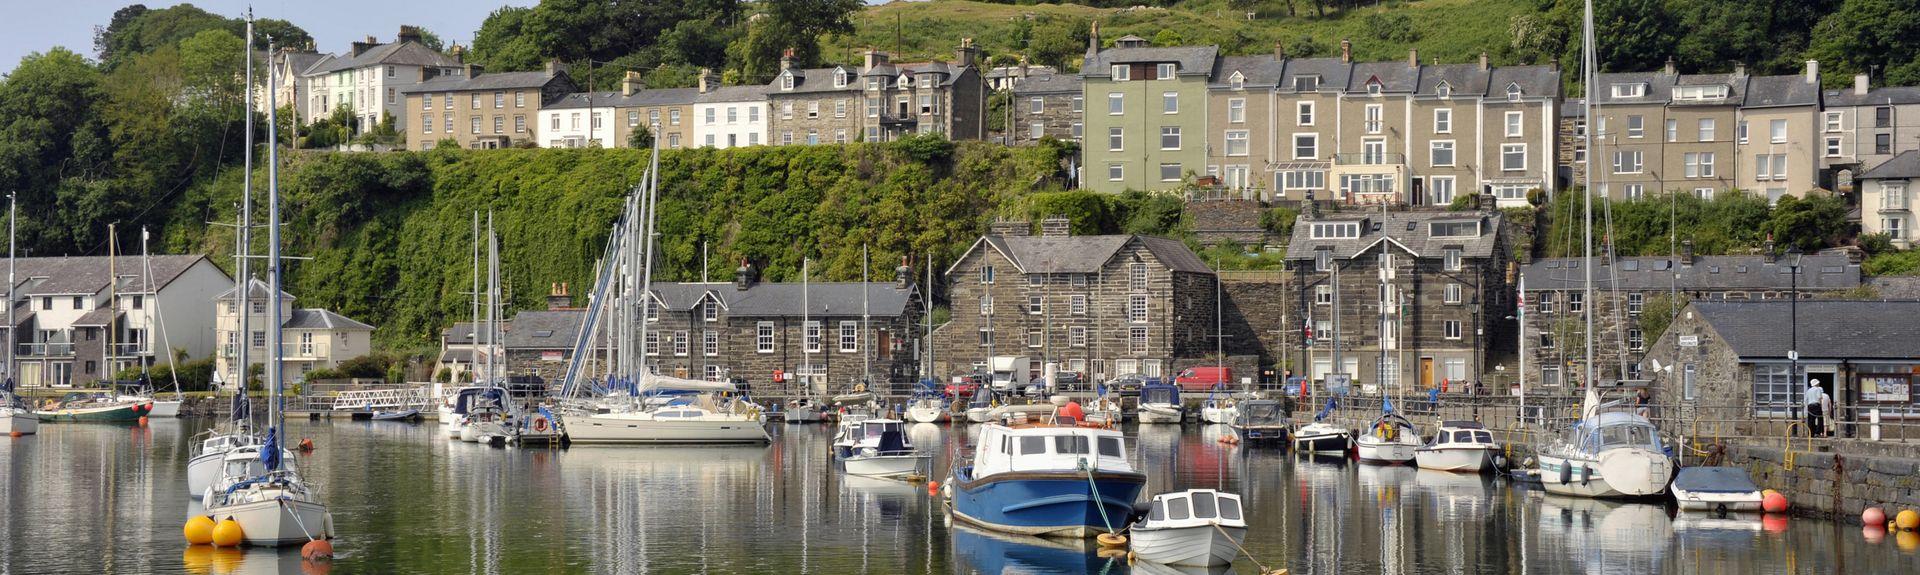 Porthmadog, Wales, Verenigd Koninkrijk